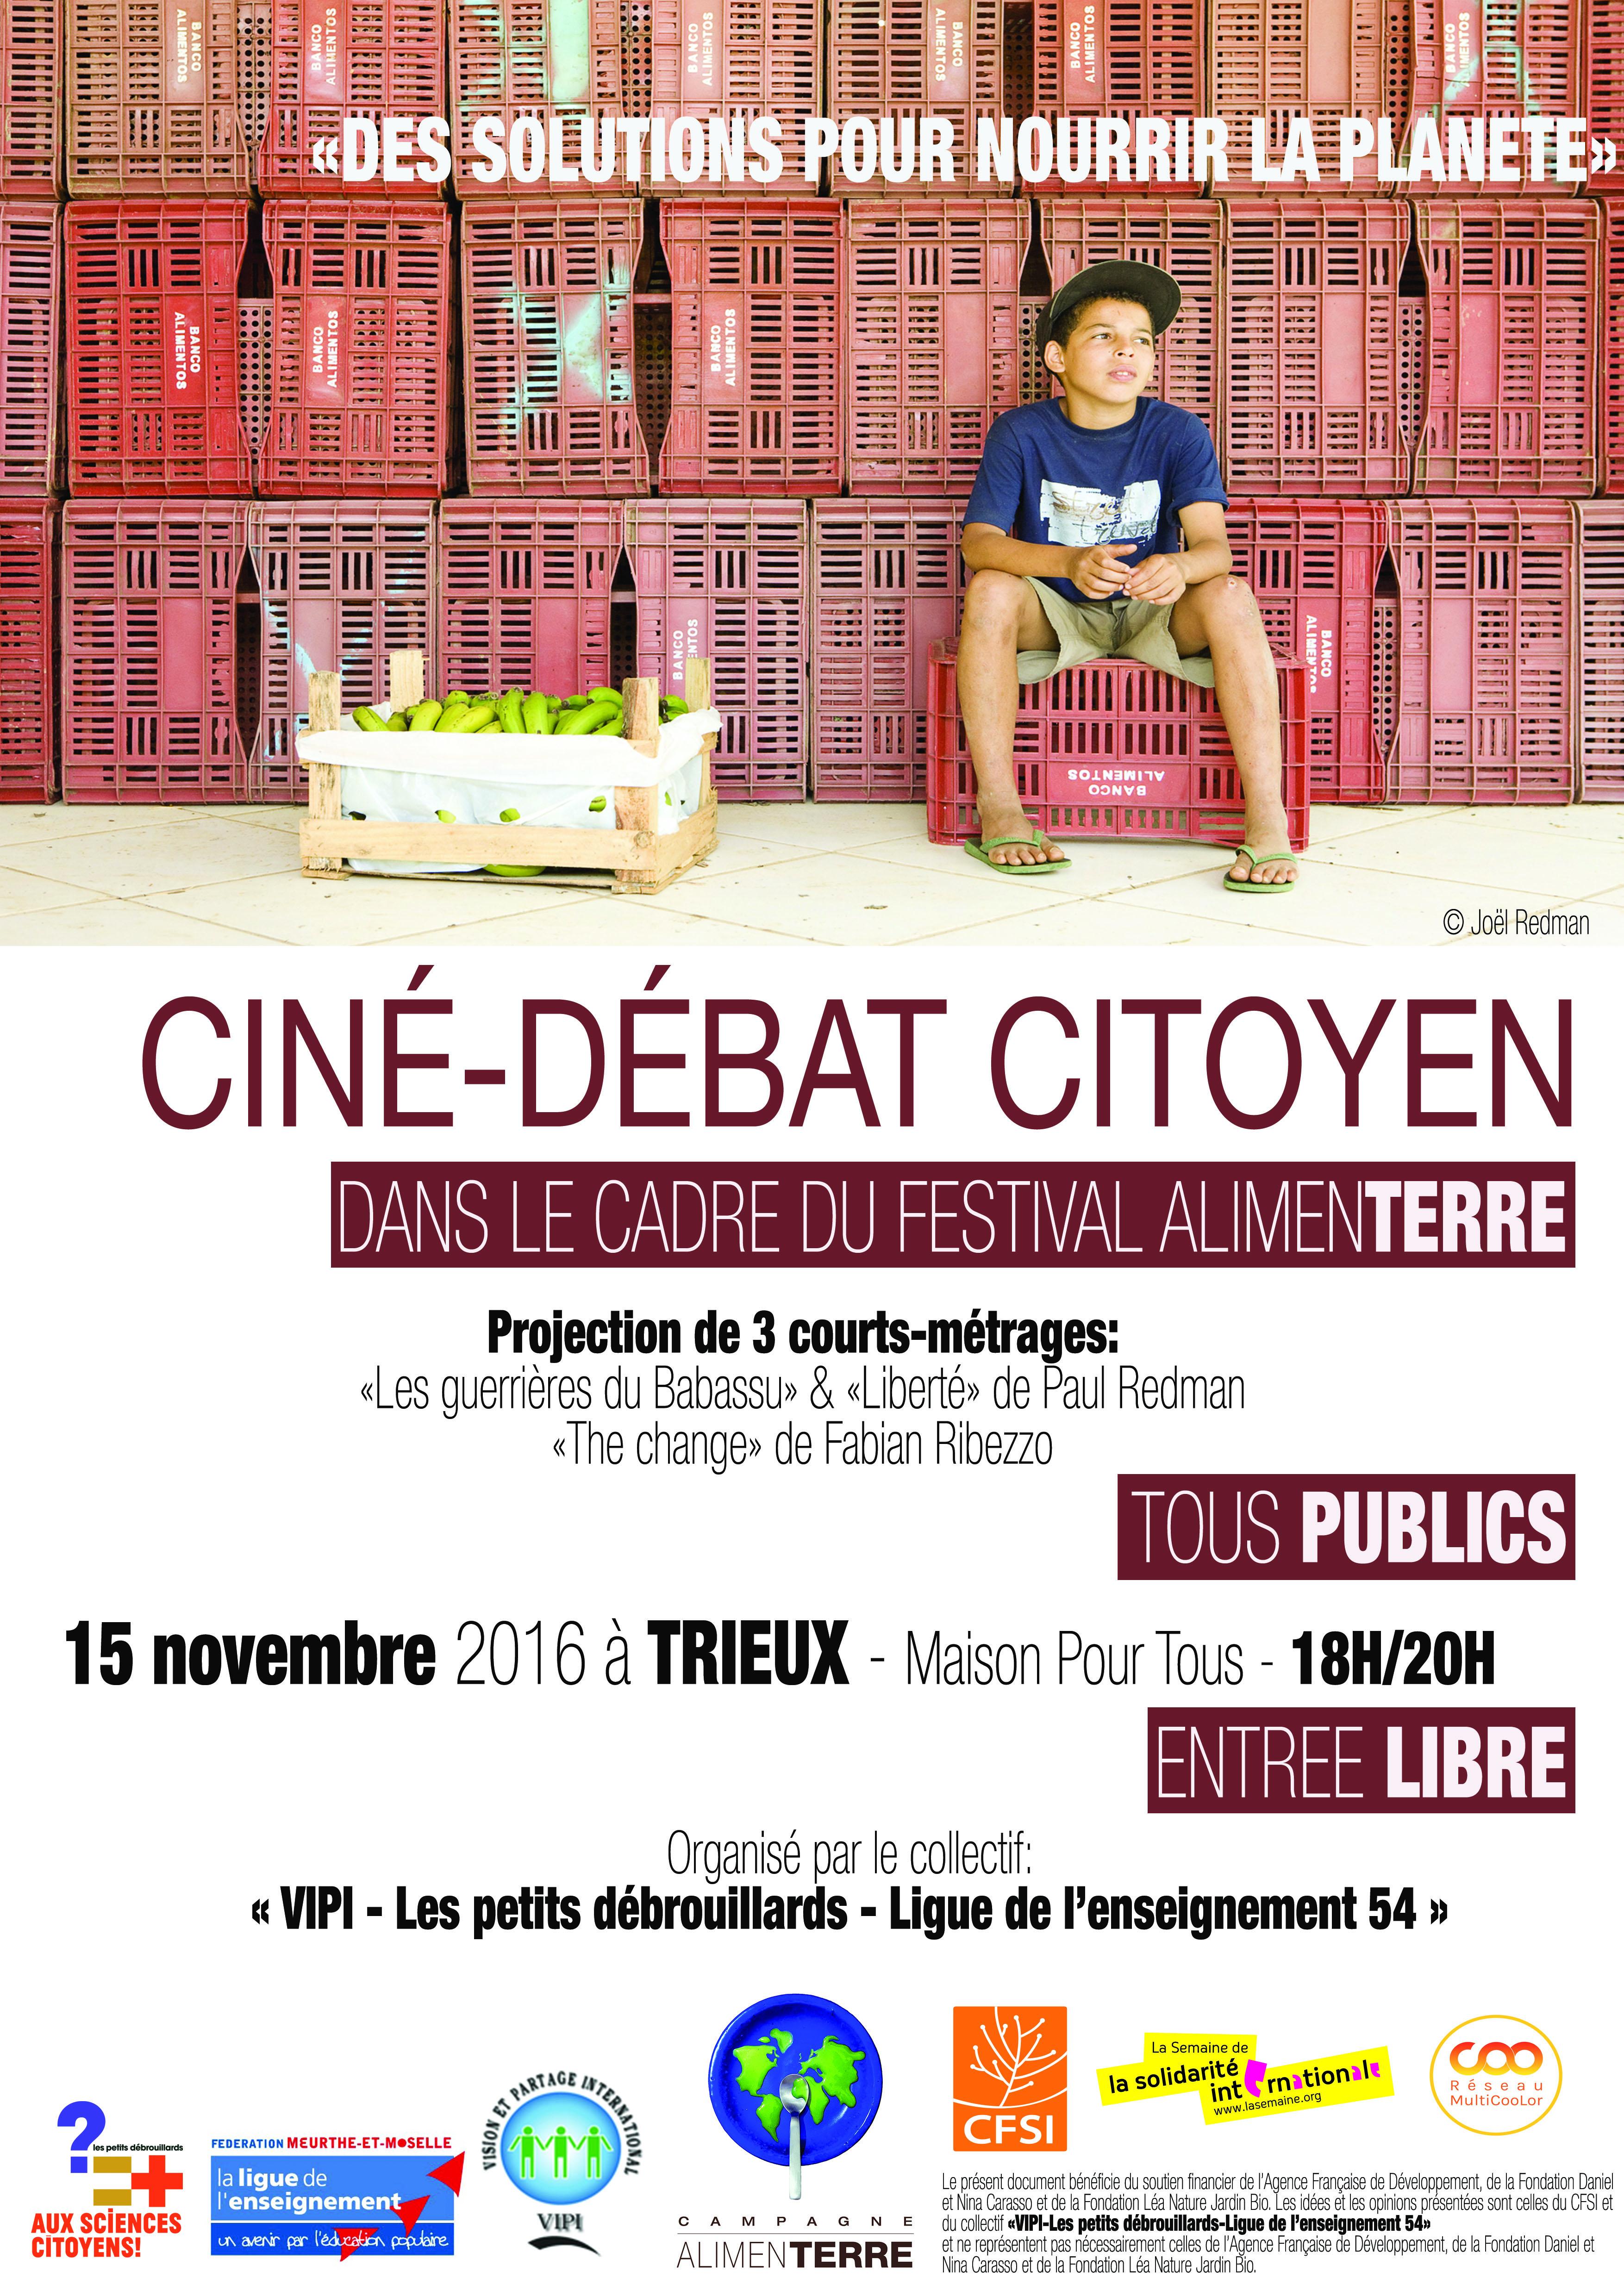 cine-debat